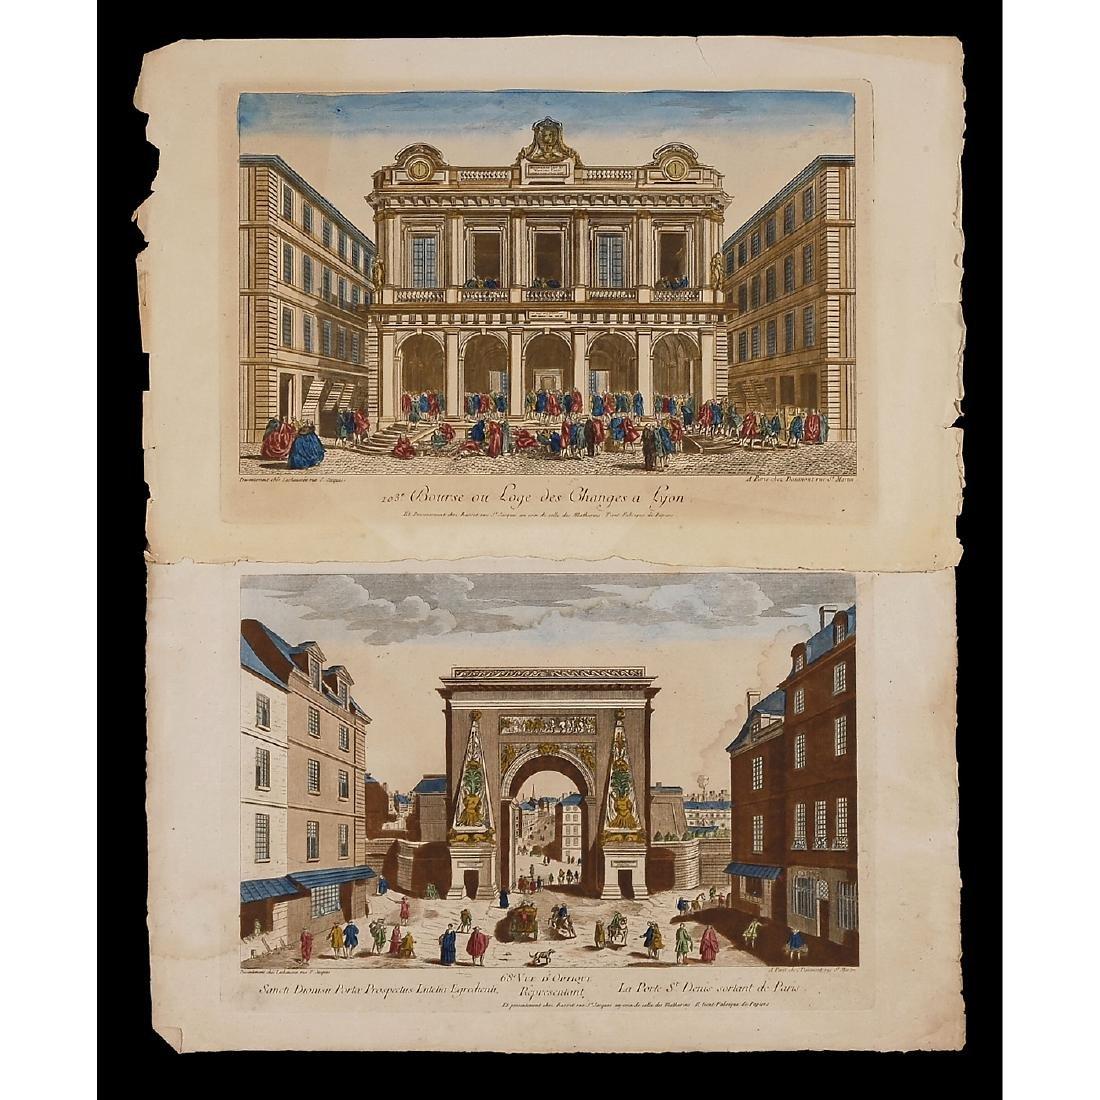 4 Vues d'Optique, c. 1765 - 2